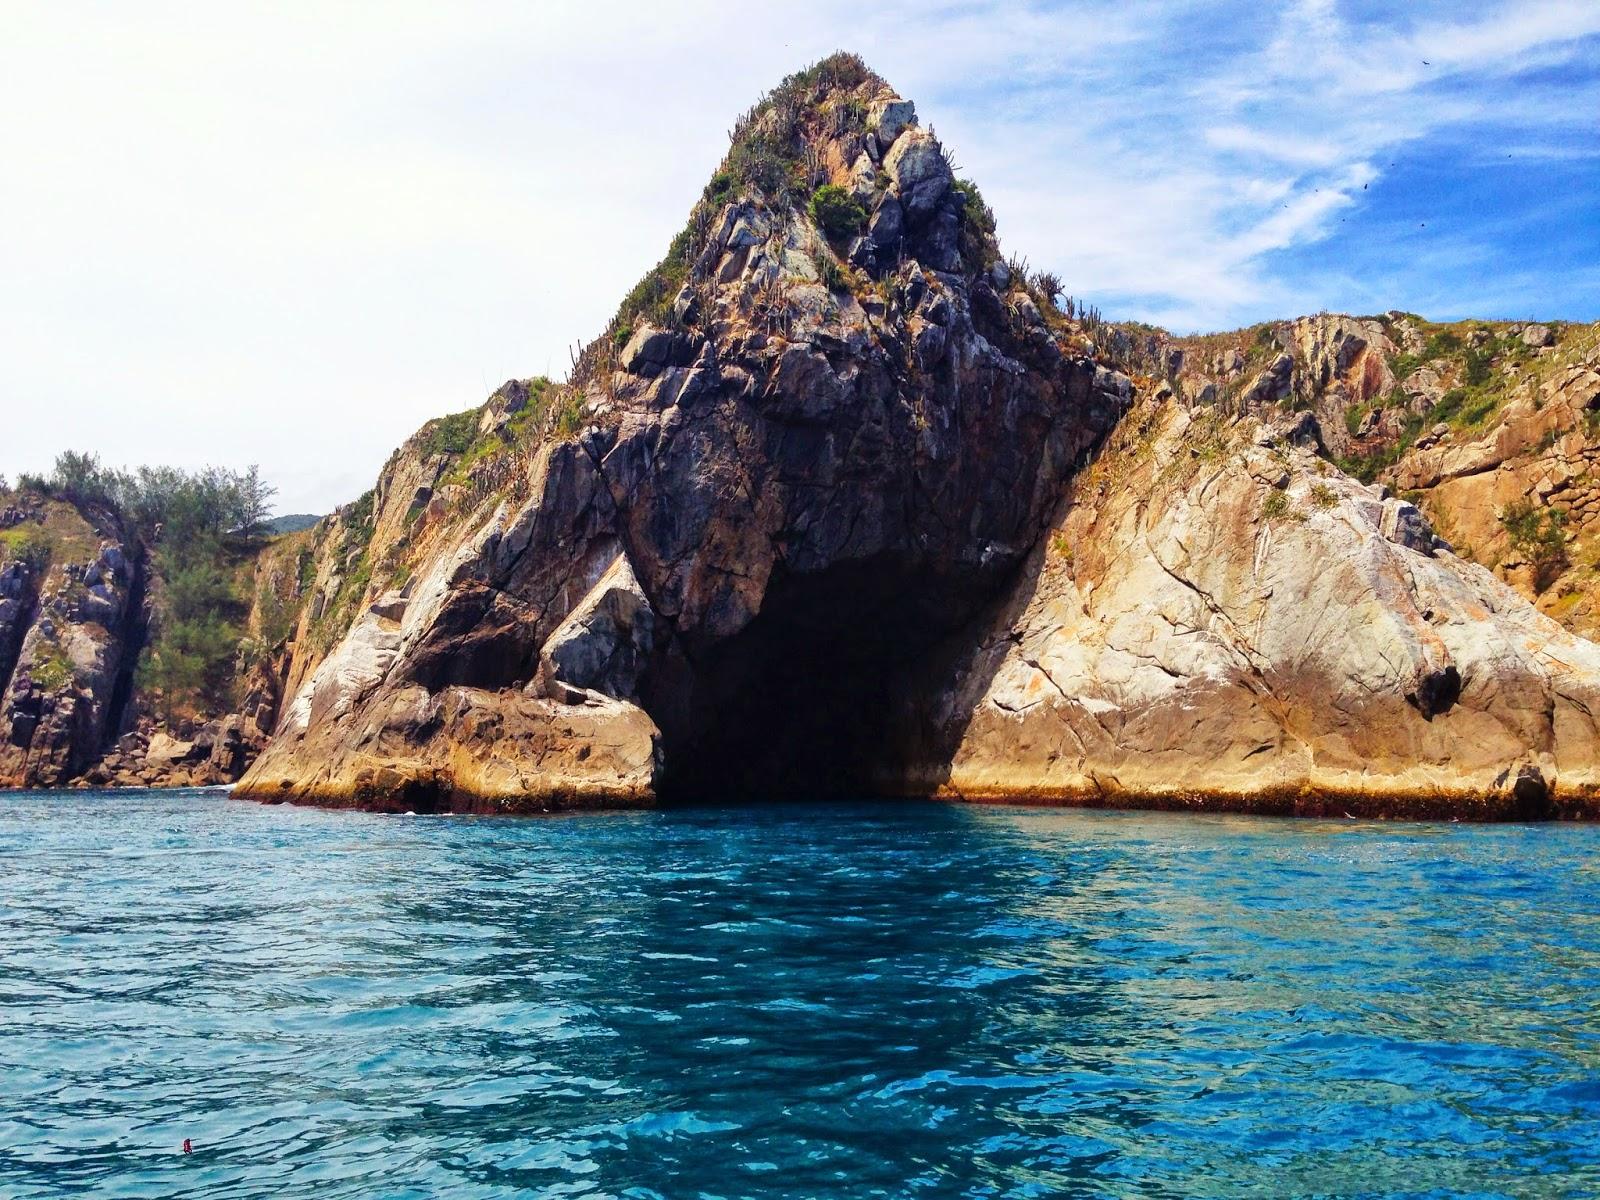 lifesthayle-arraial-do-cabo-gruta-azul.JPG